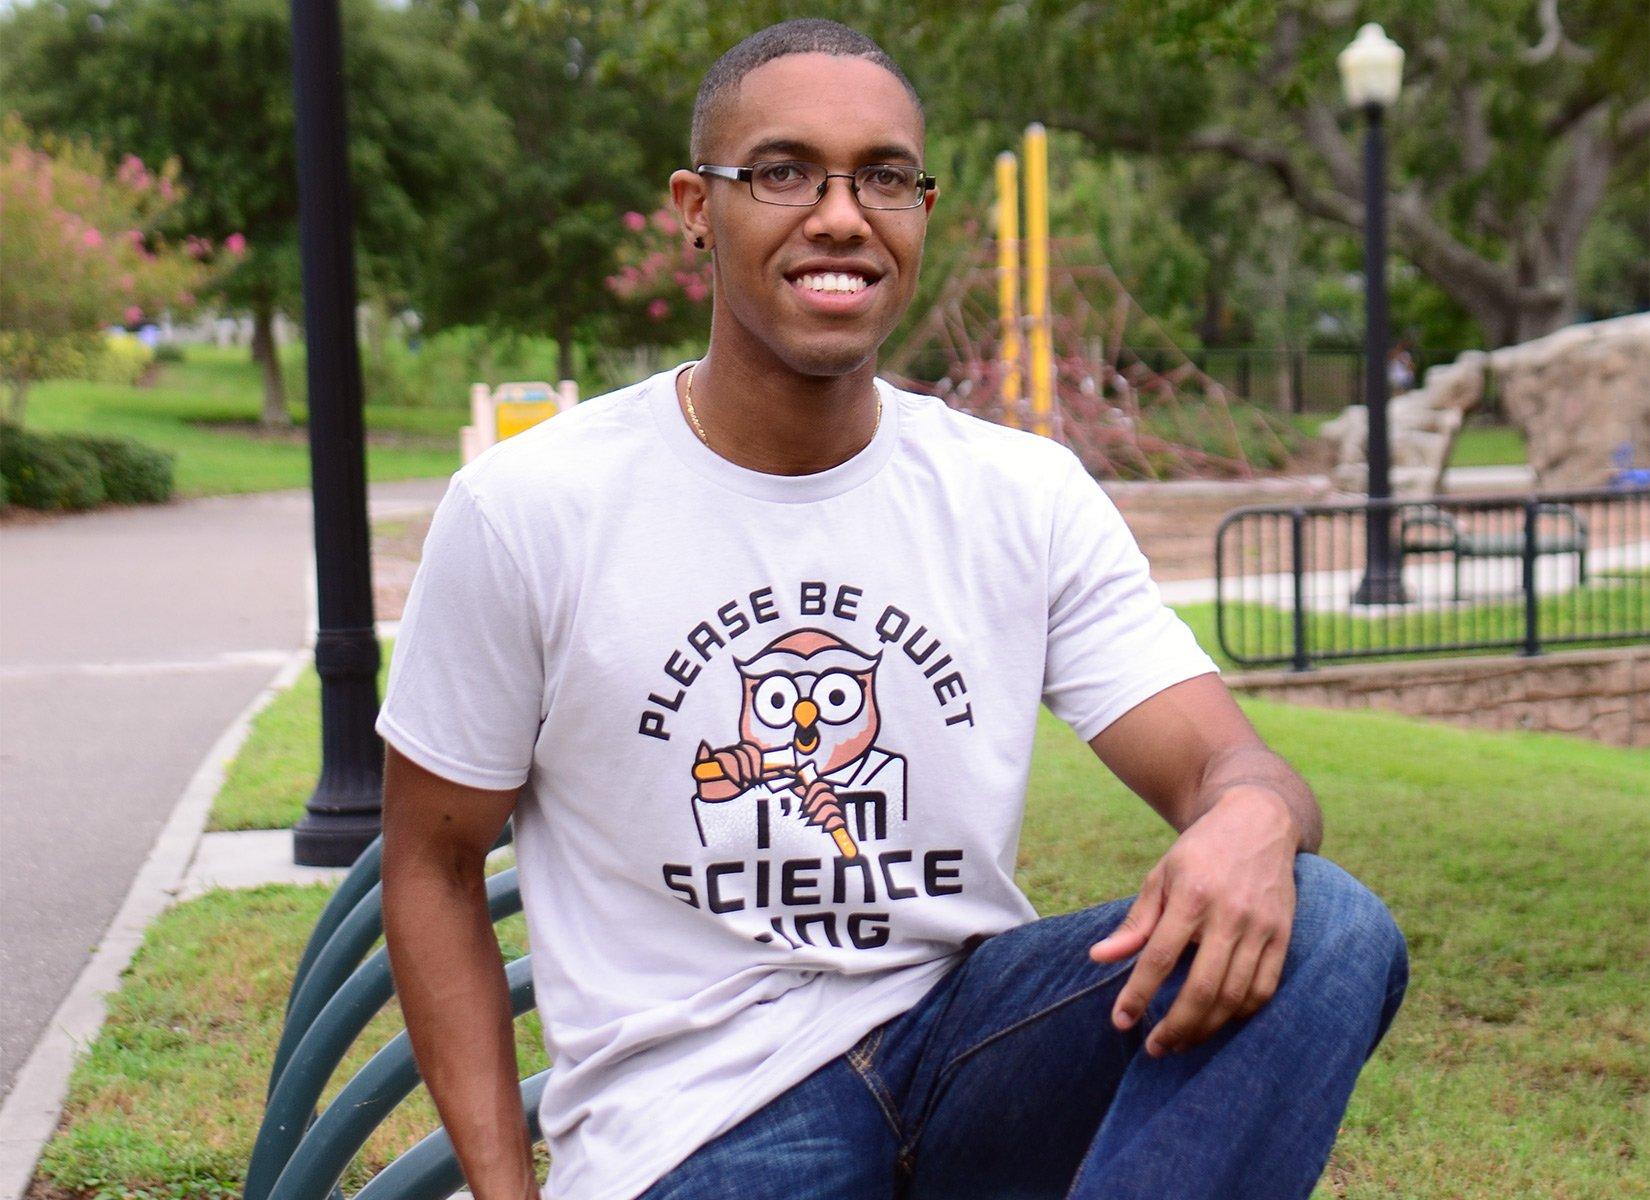 I'm Science-ing on Mens T-Shirt